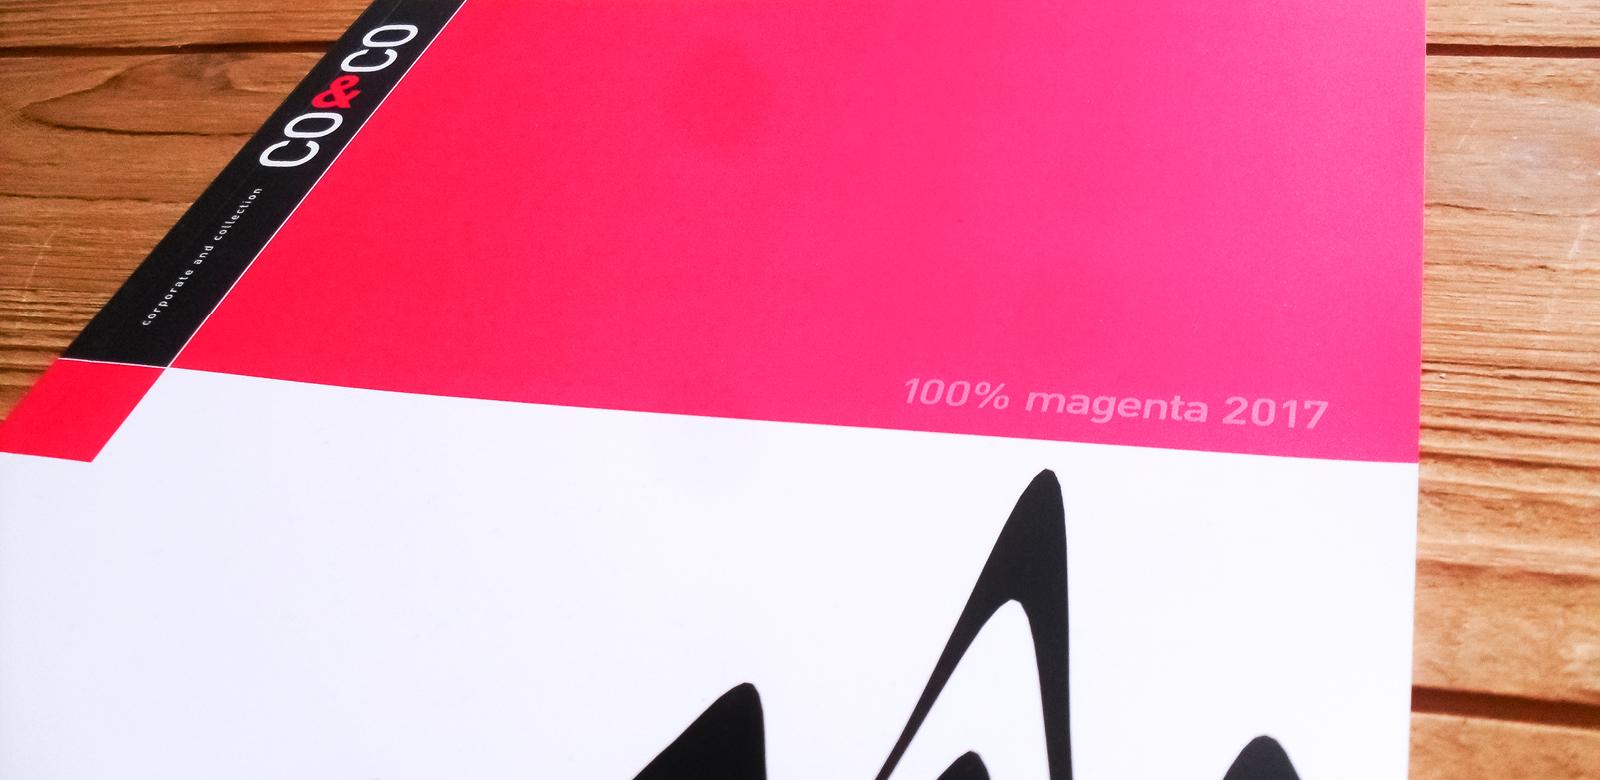 100% magenta 2017 Cover